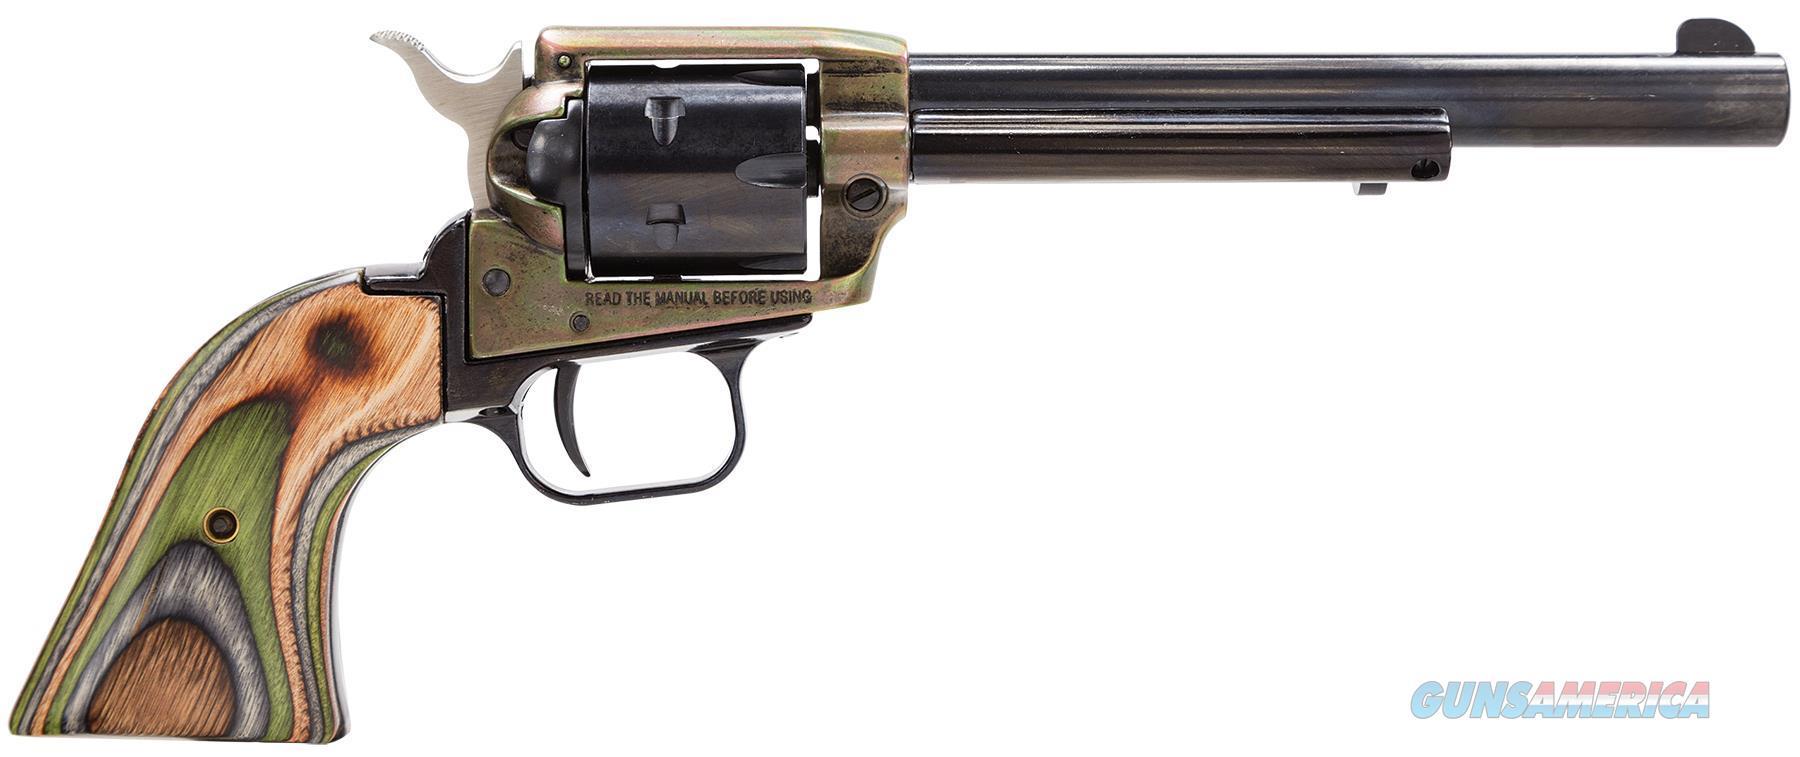 "Heritage Mfg Rr22ch6 Rough Rider Small Bore Single 22 Long Rifle 6.5"" 6 Camo Laminate Blued RR22CH6  Guns > Pistols > Heritage"